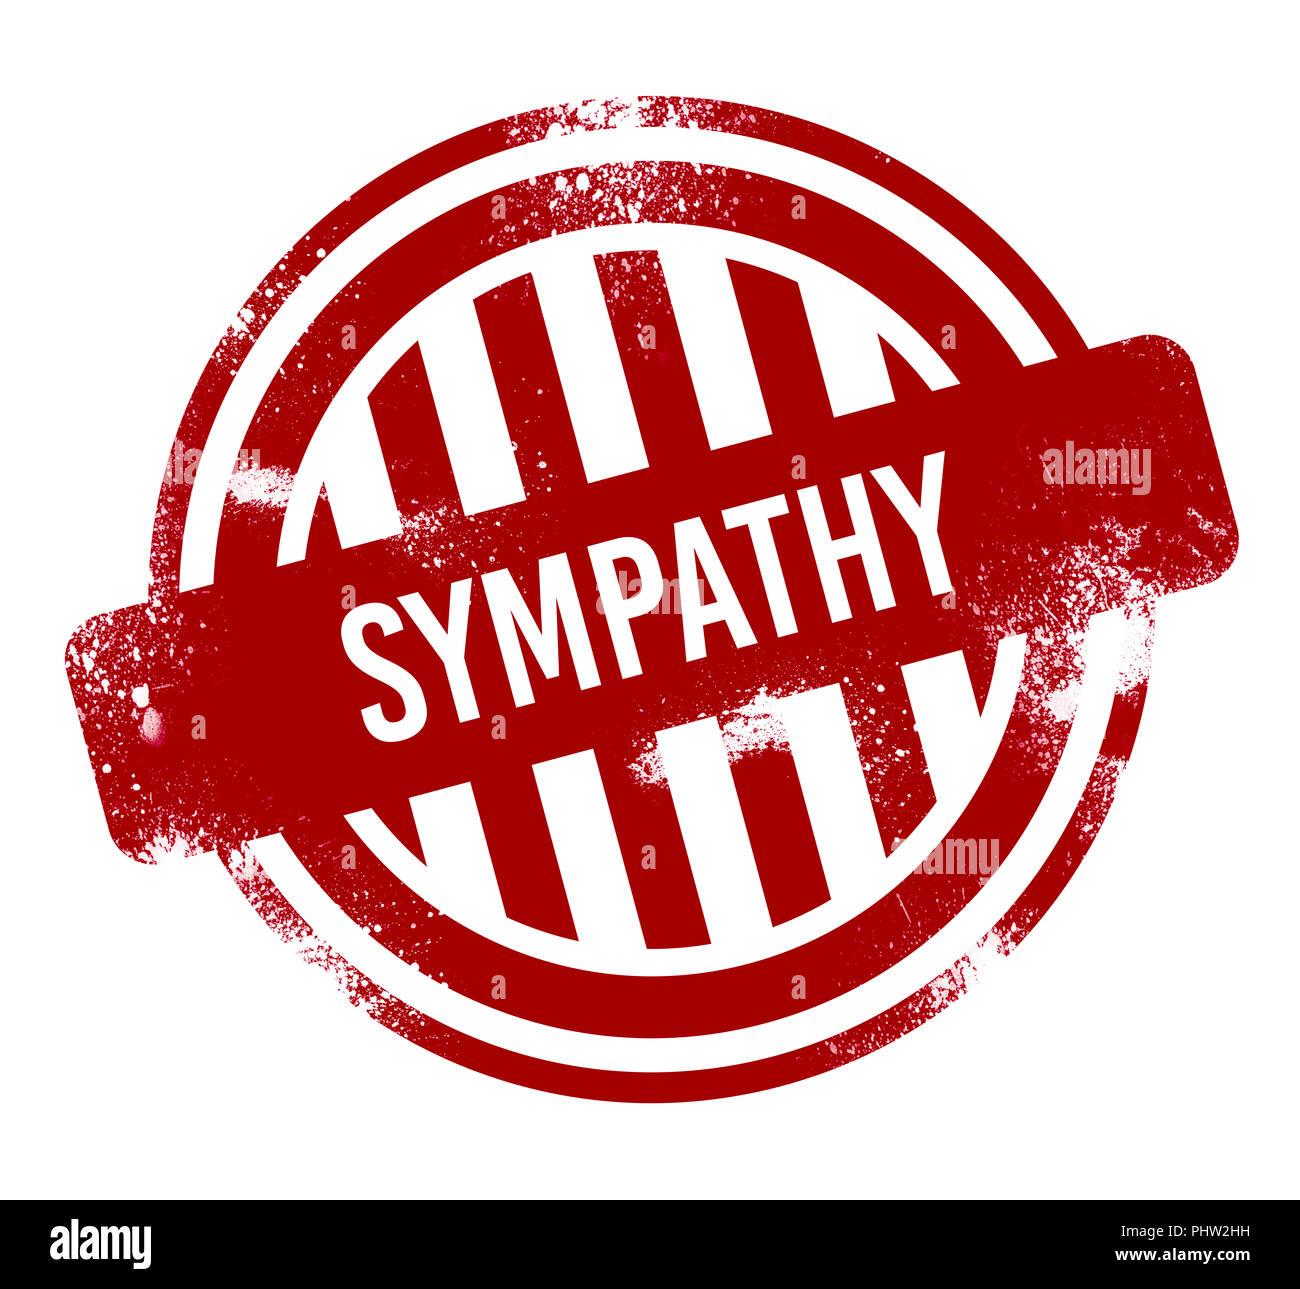 Sympathie - grunge stamp, bouton rouge Photo Stock